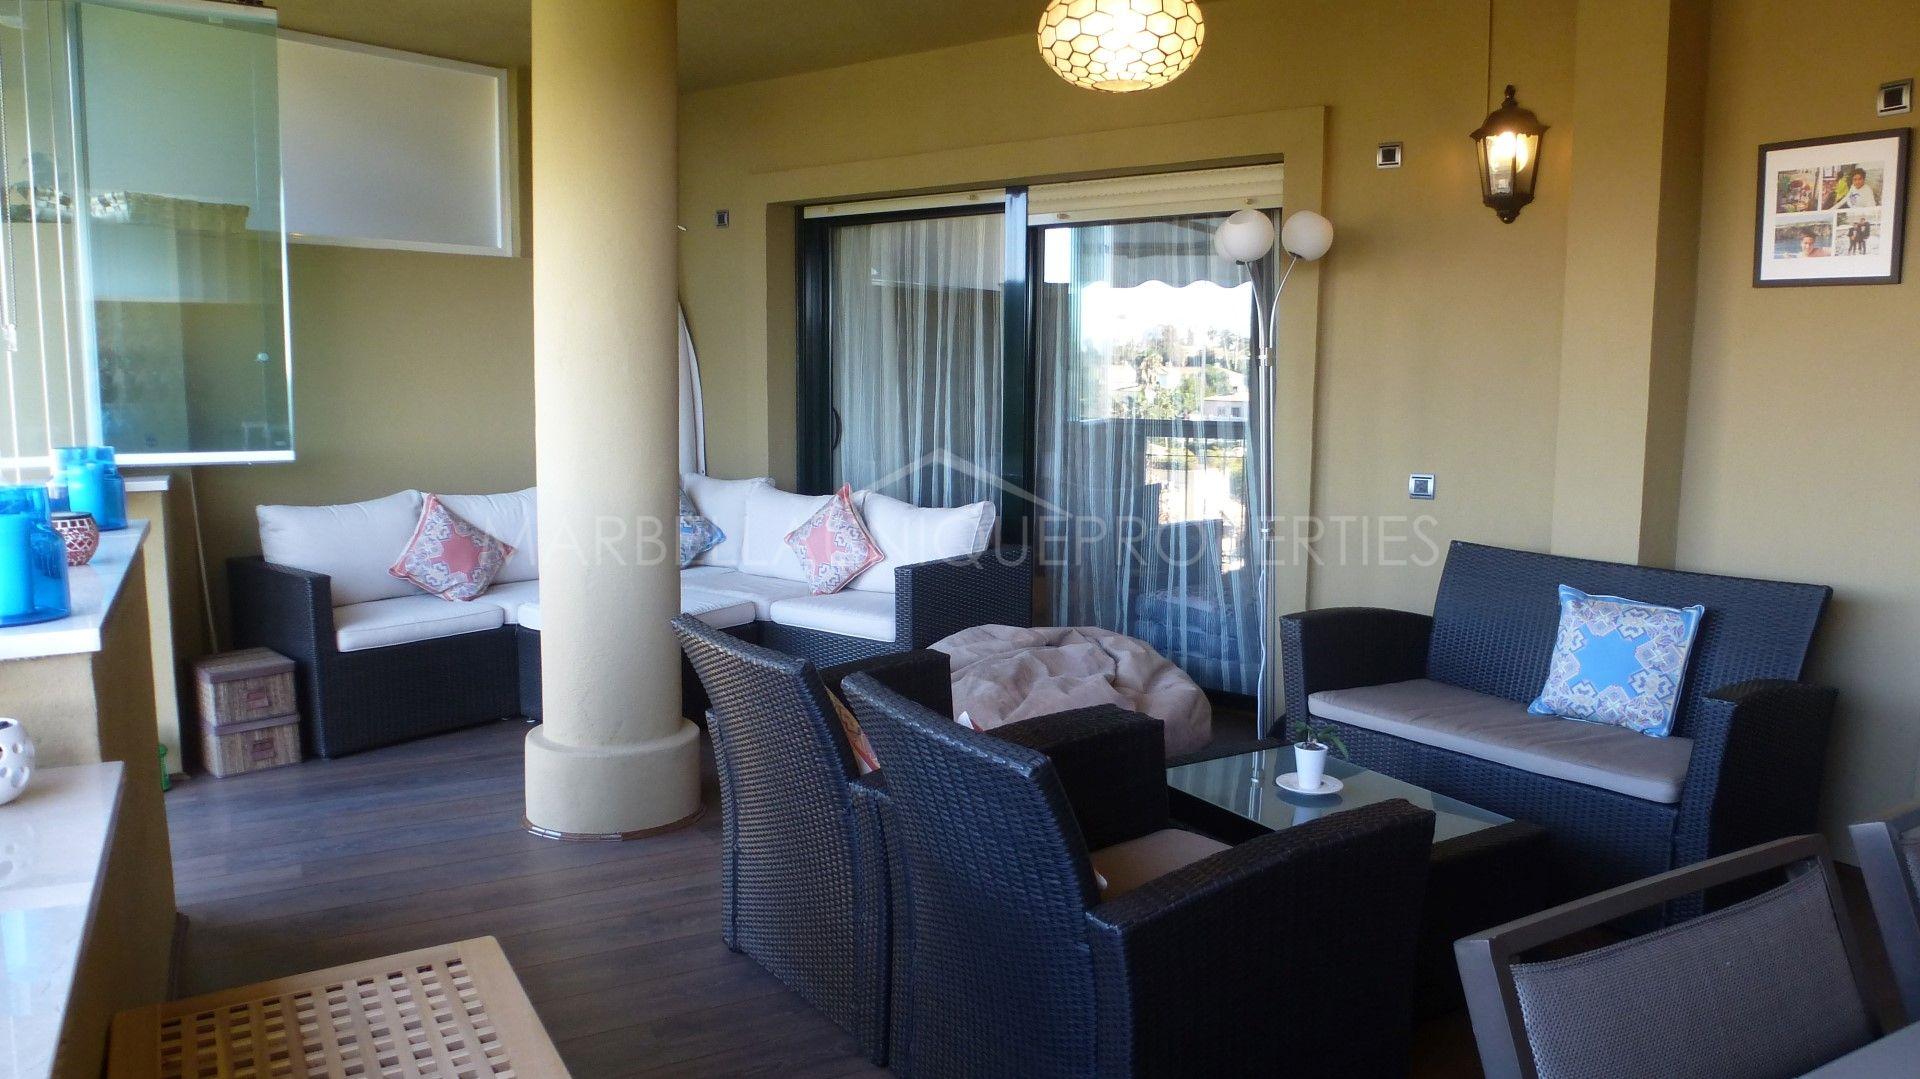 A stunning frontline golf 3 bedroom duplex penthouse in Guadalmina Alta